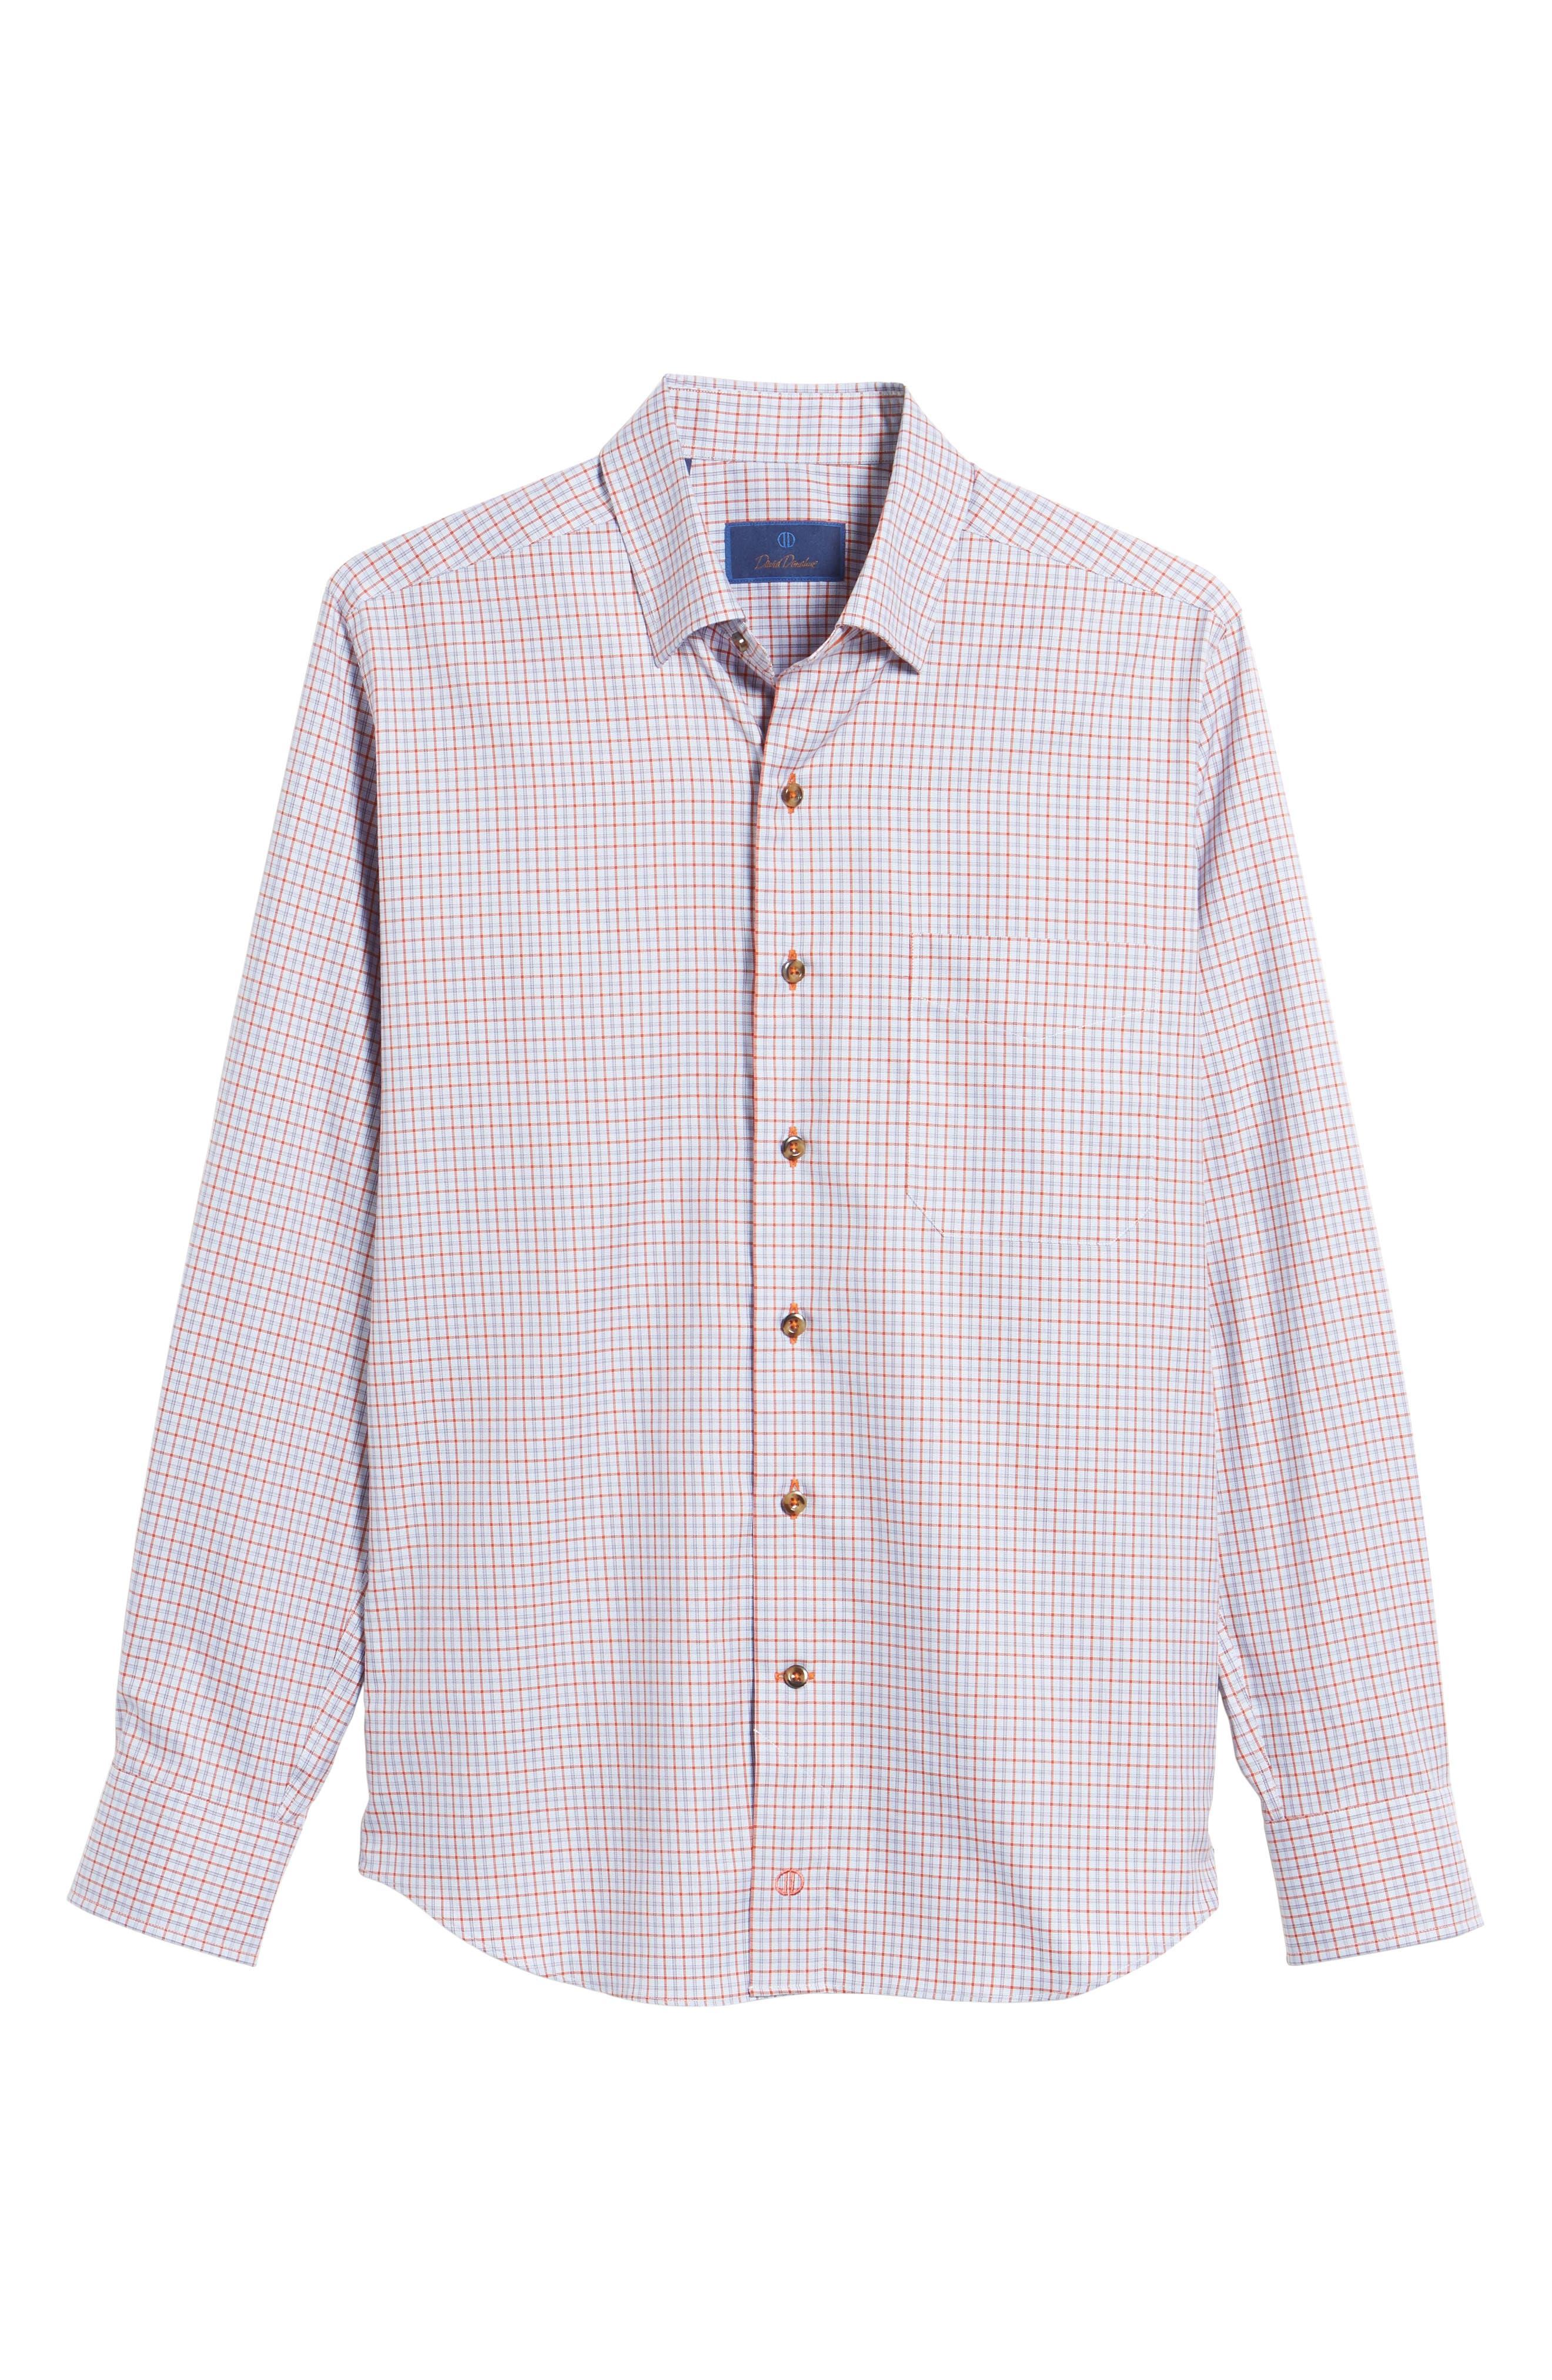 Regular Fit Plaid Sport Shirt,                             Alternate thumbnail 6, color,                             804